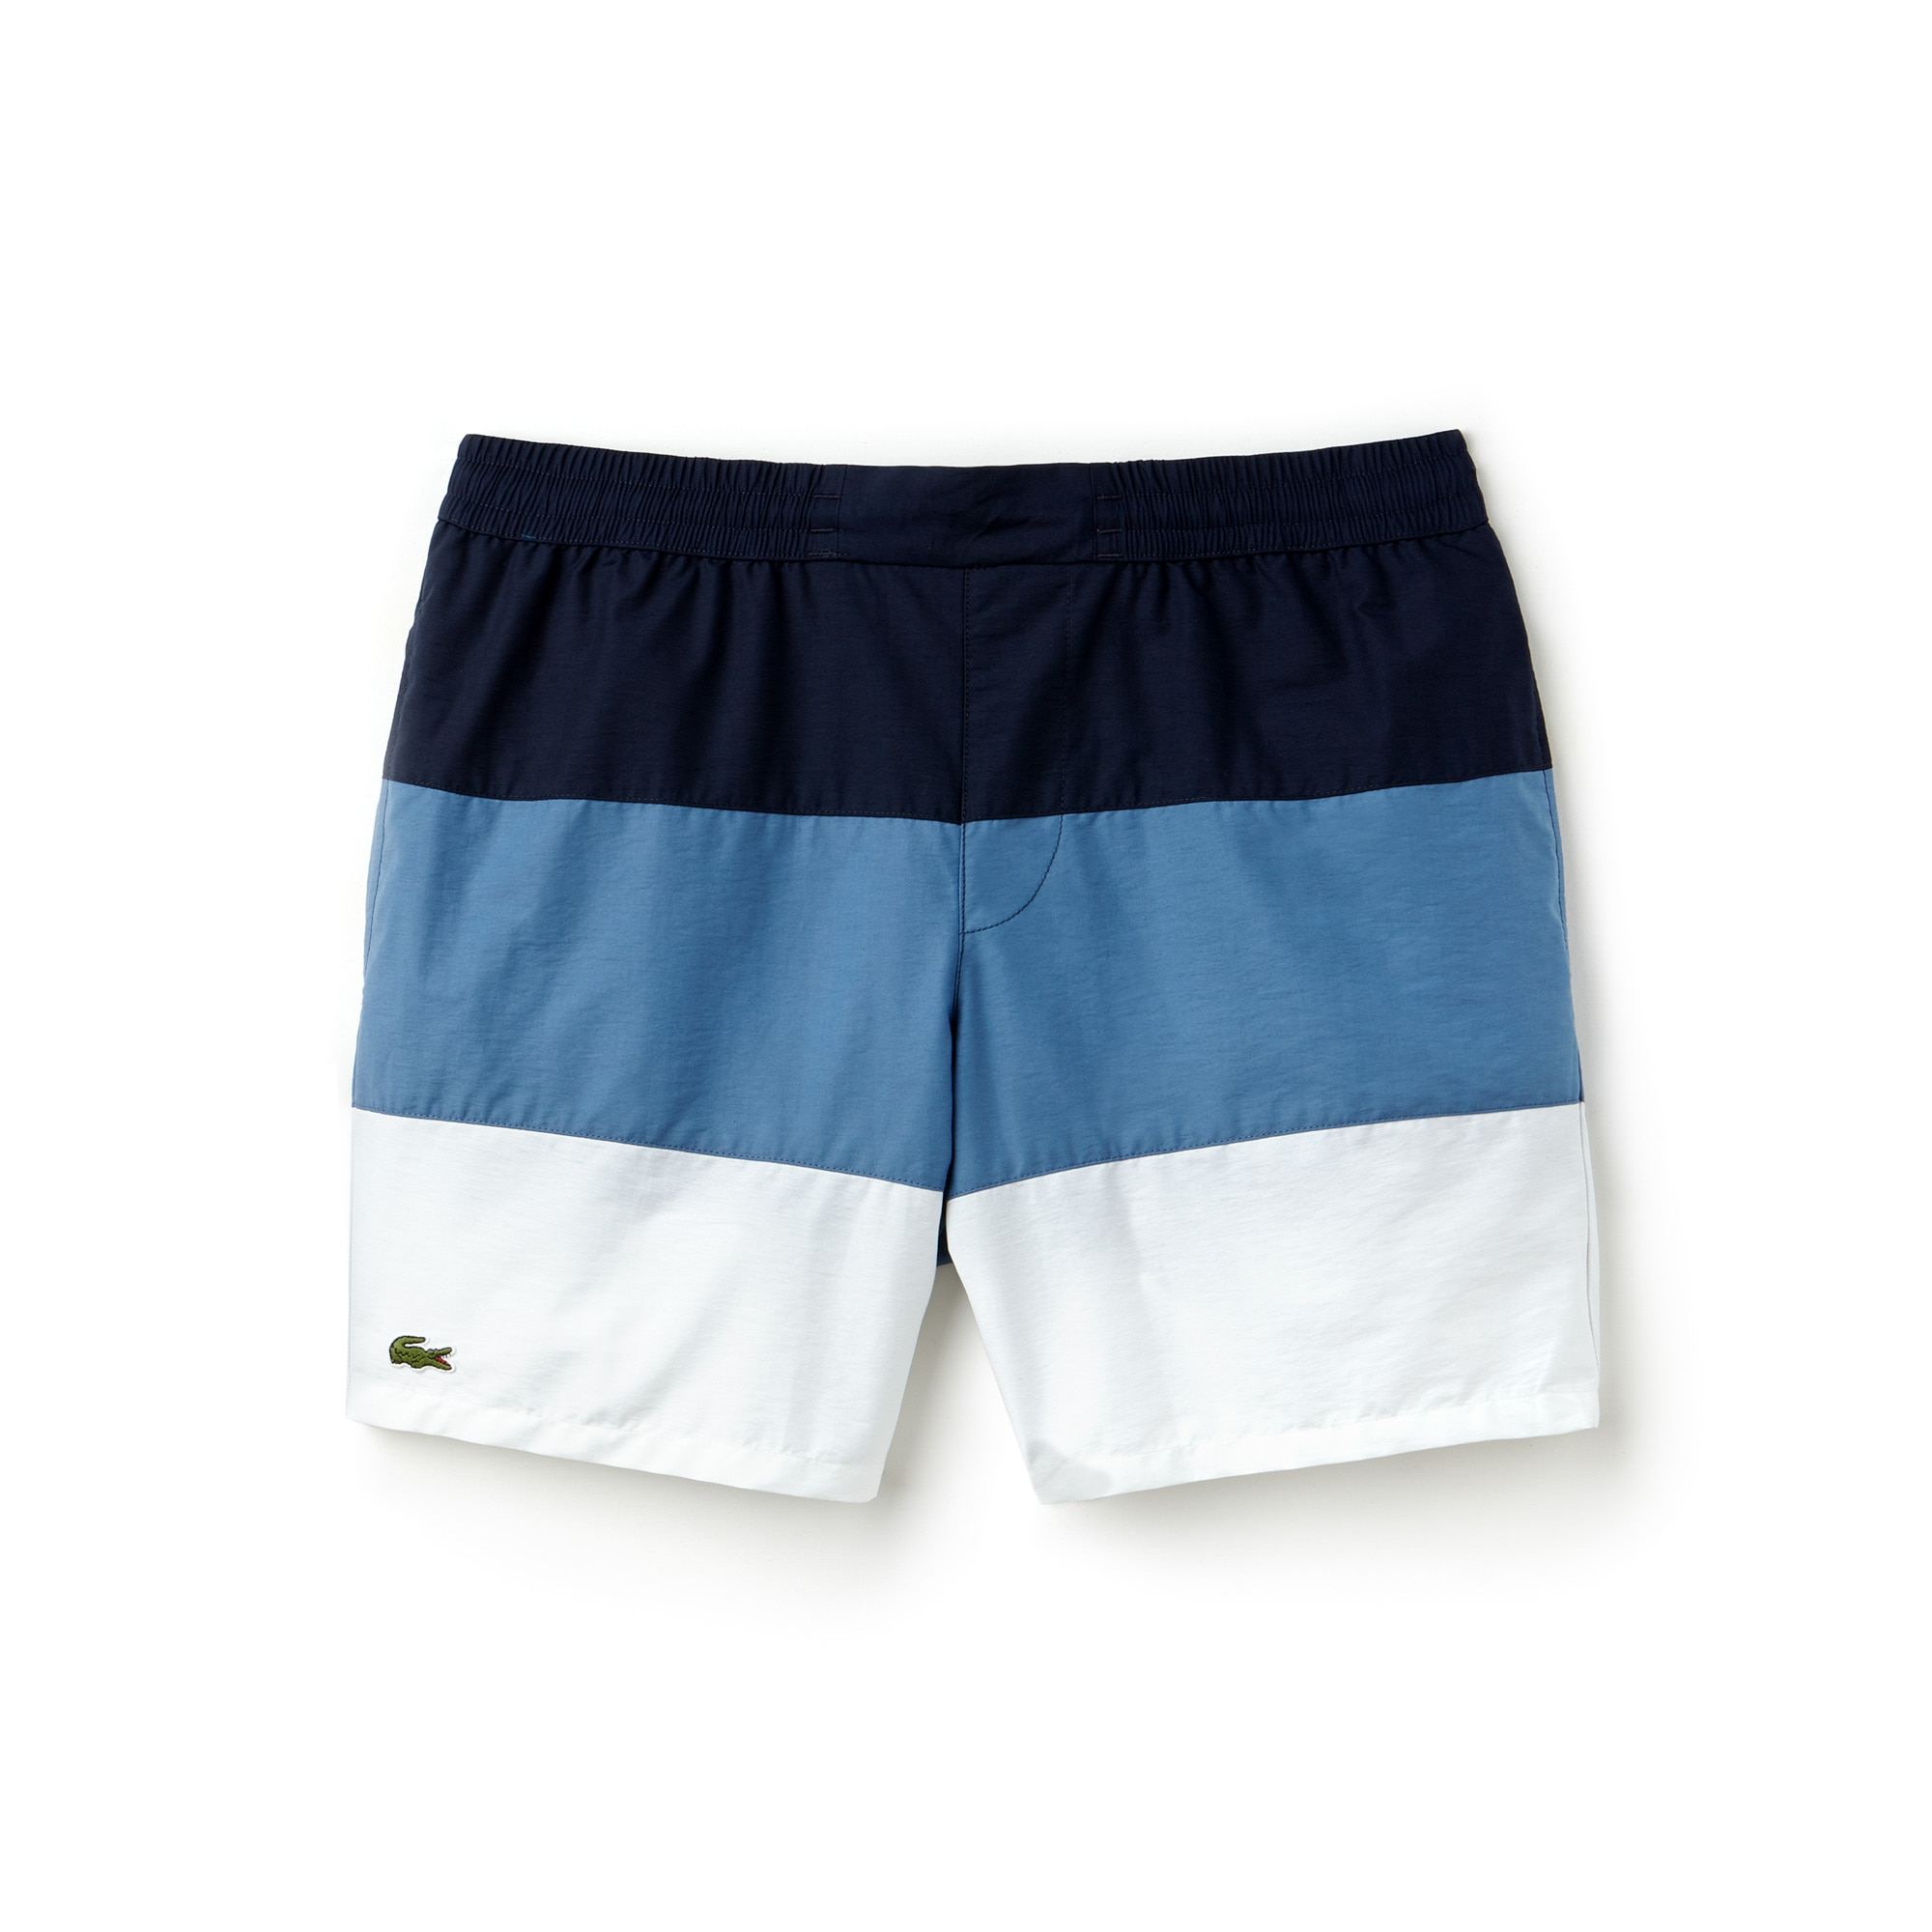 Men's Colorblock Taffeta Swimming Trunks